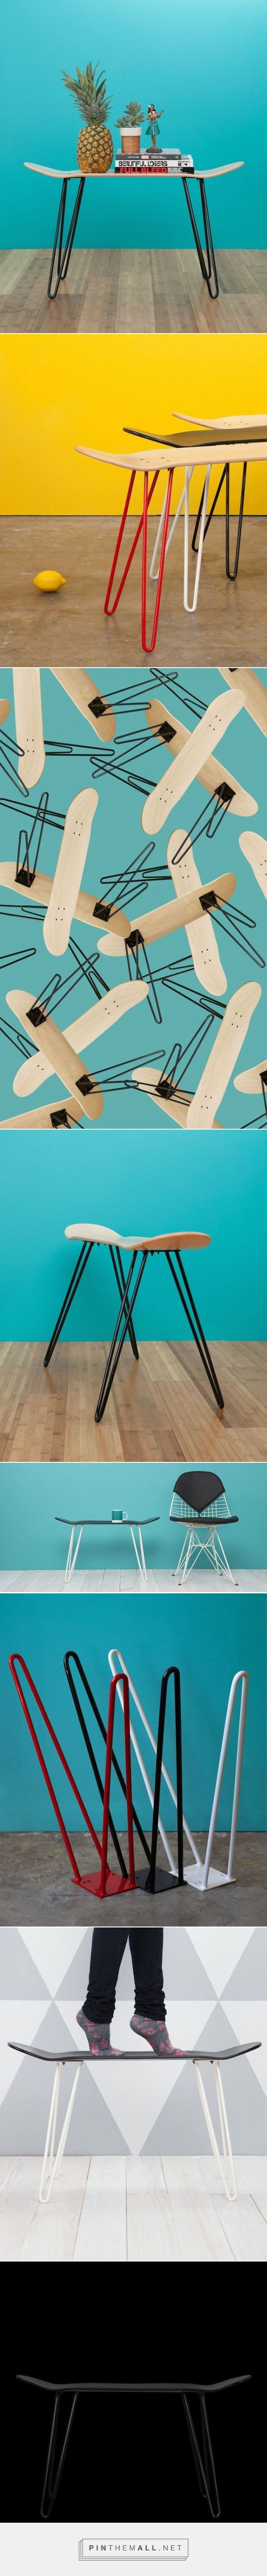 80 best Furniture images on Pinterest   Product design, Furniture ...